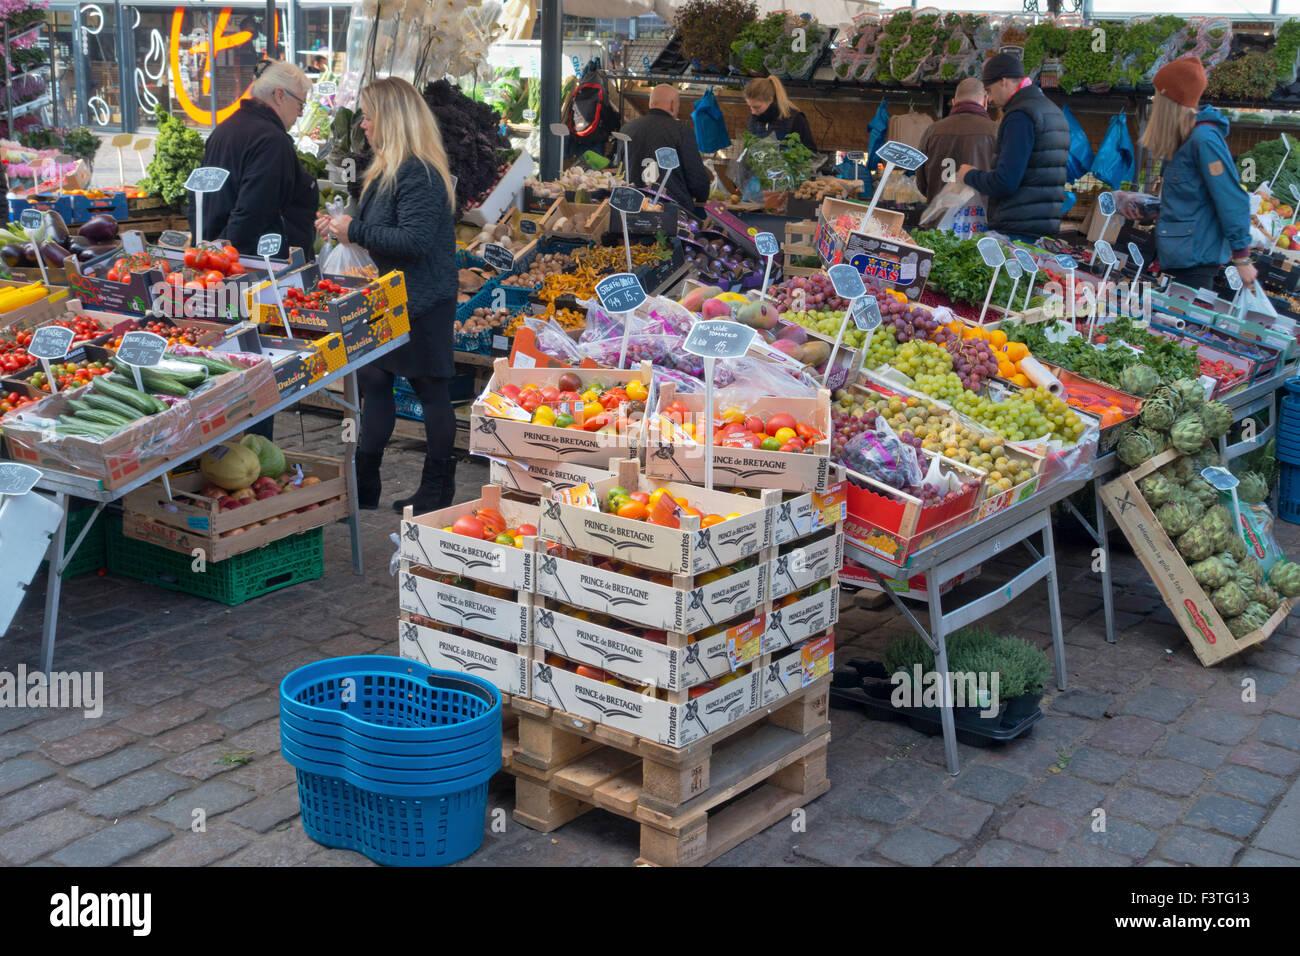 Outdoor fruit and vegetable stalls at Torvehallerne, the covered food market,  at Israels Plads in Copenhagen, Denmark - Stock Image